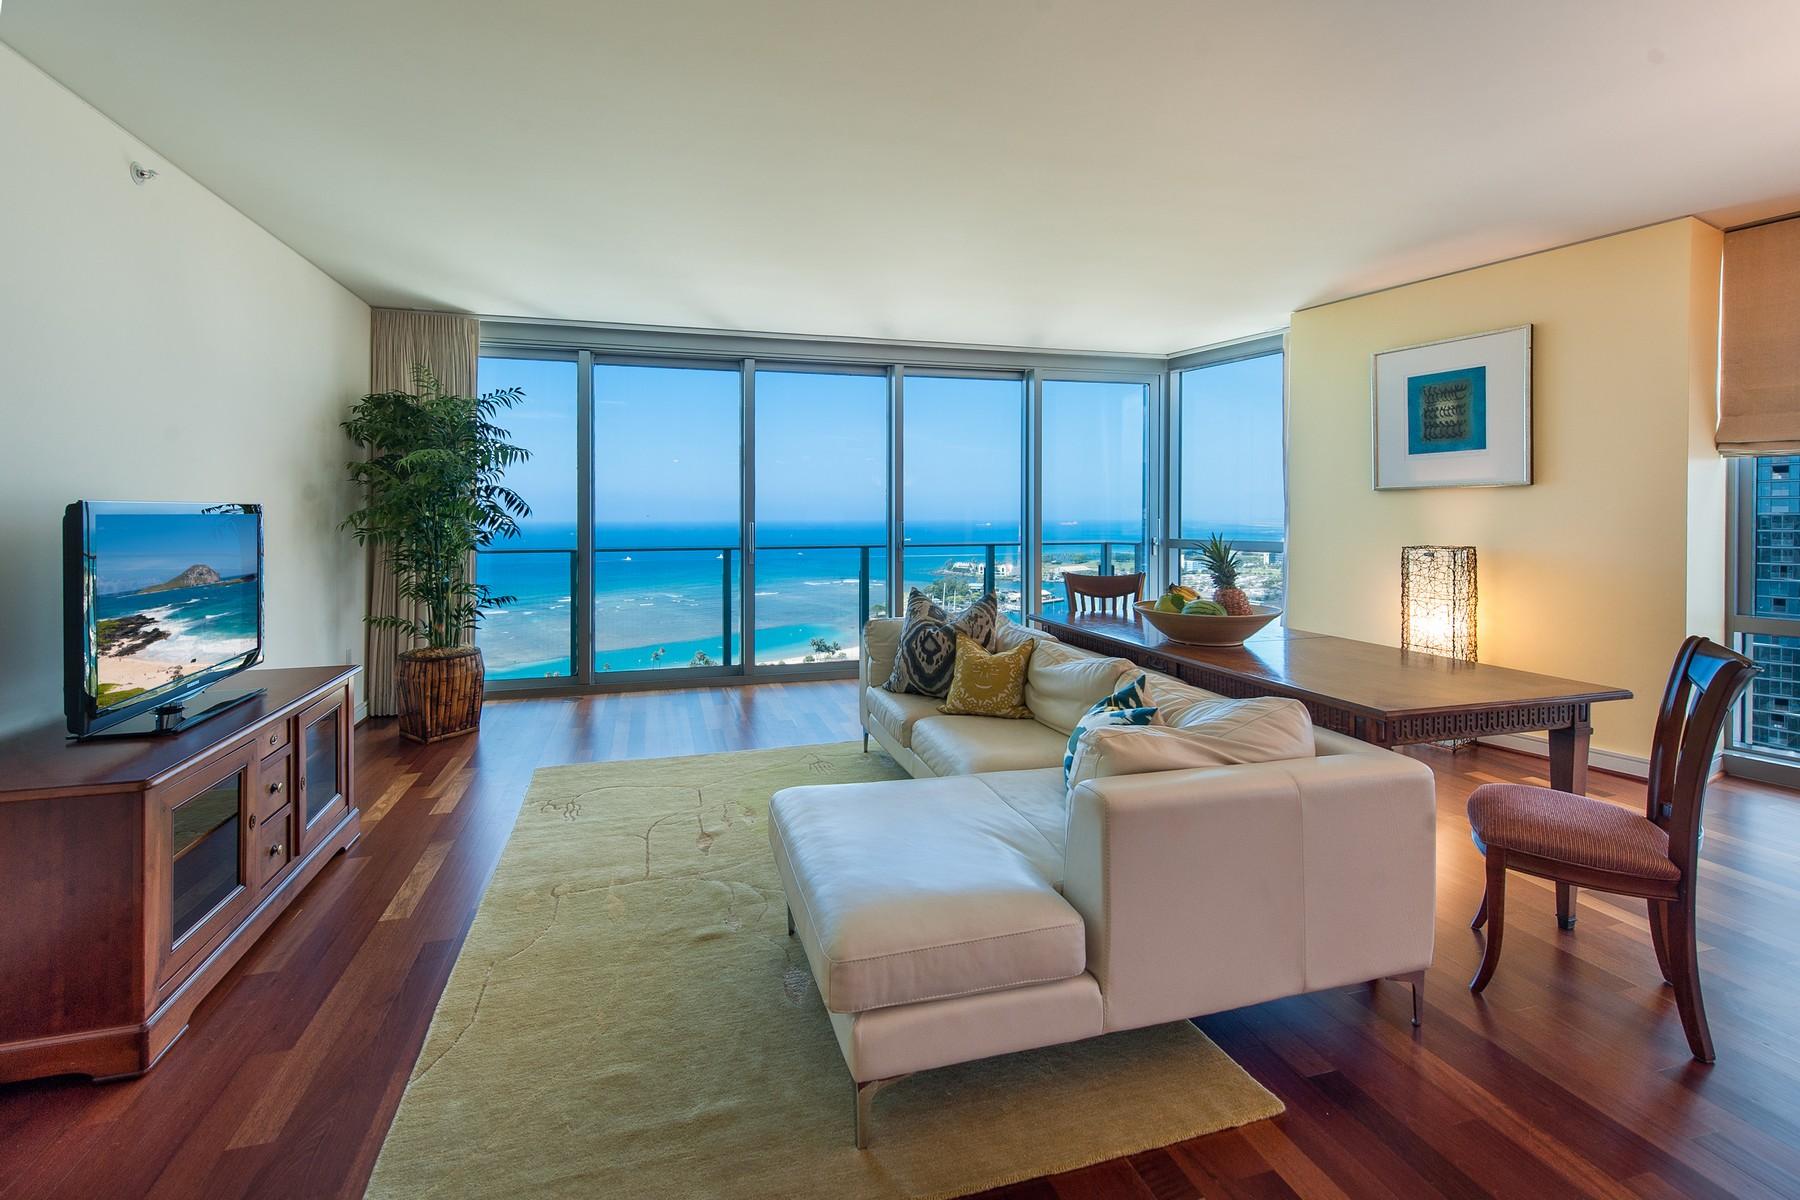 Condominium for Sale at Stunning Ocean Views 1288 Ala Moana Blvd. #29A Honolulu, Hawaii 96814 United States